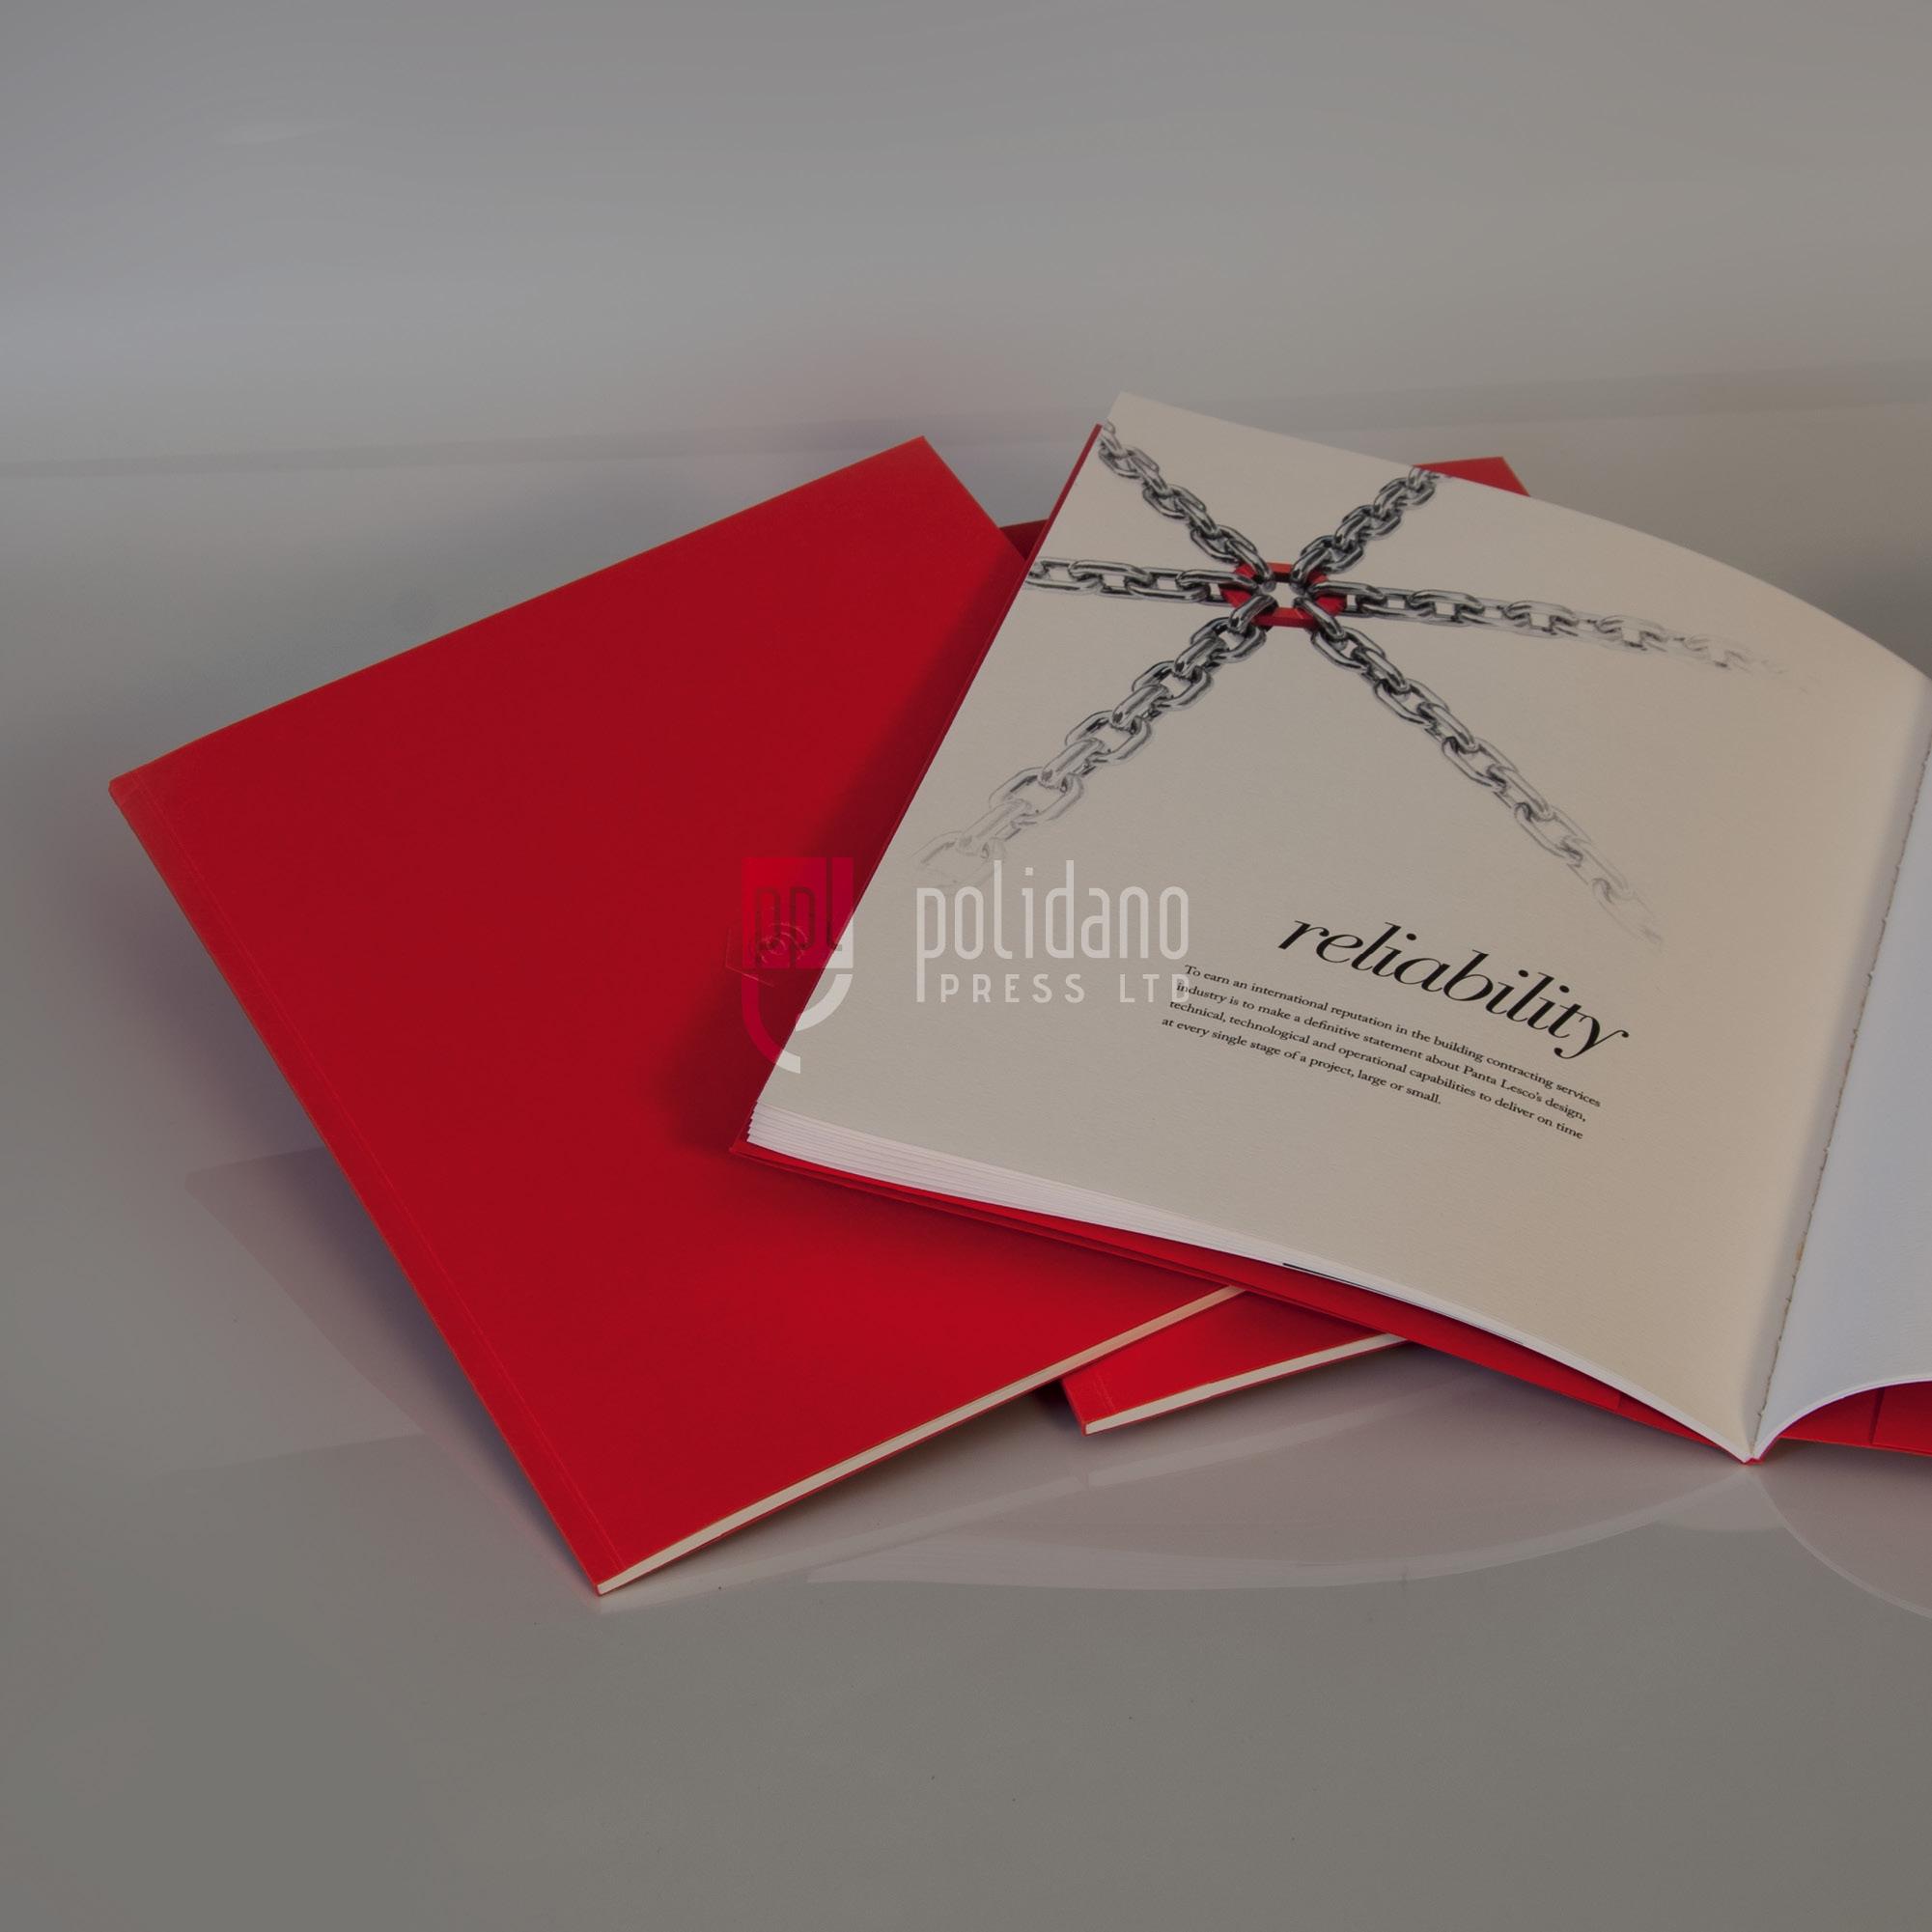 Perfect Bound Corporate Book